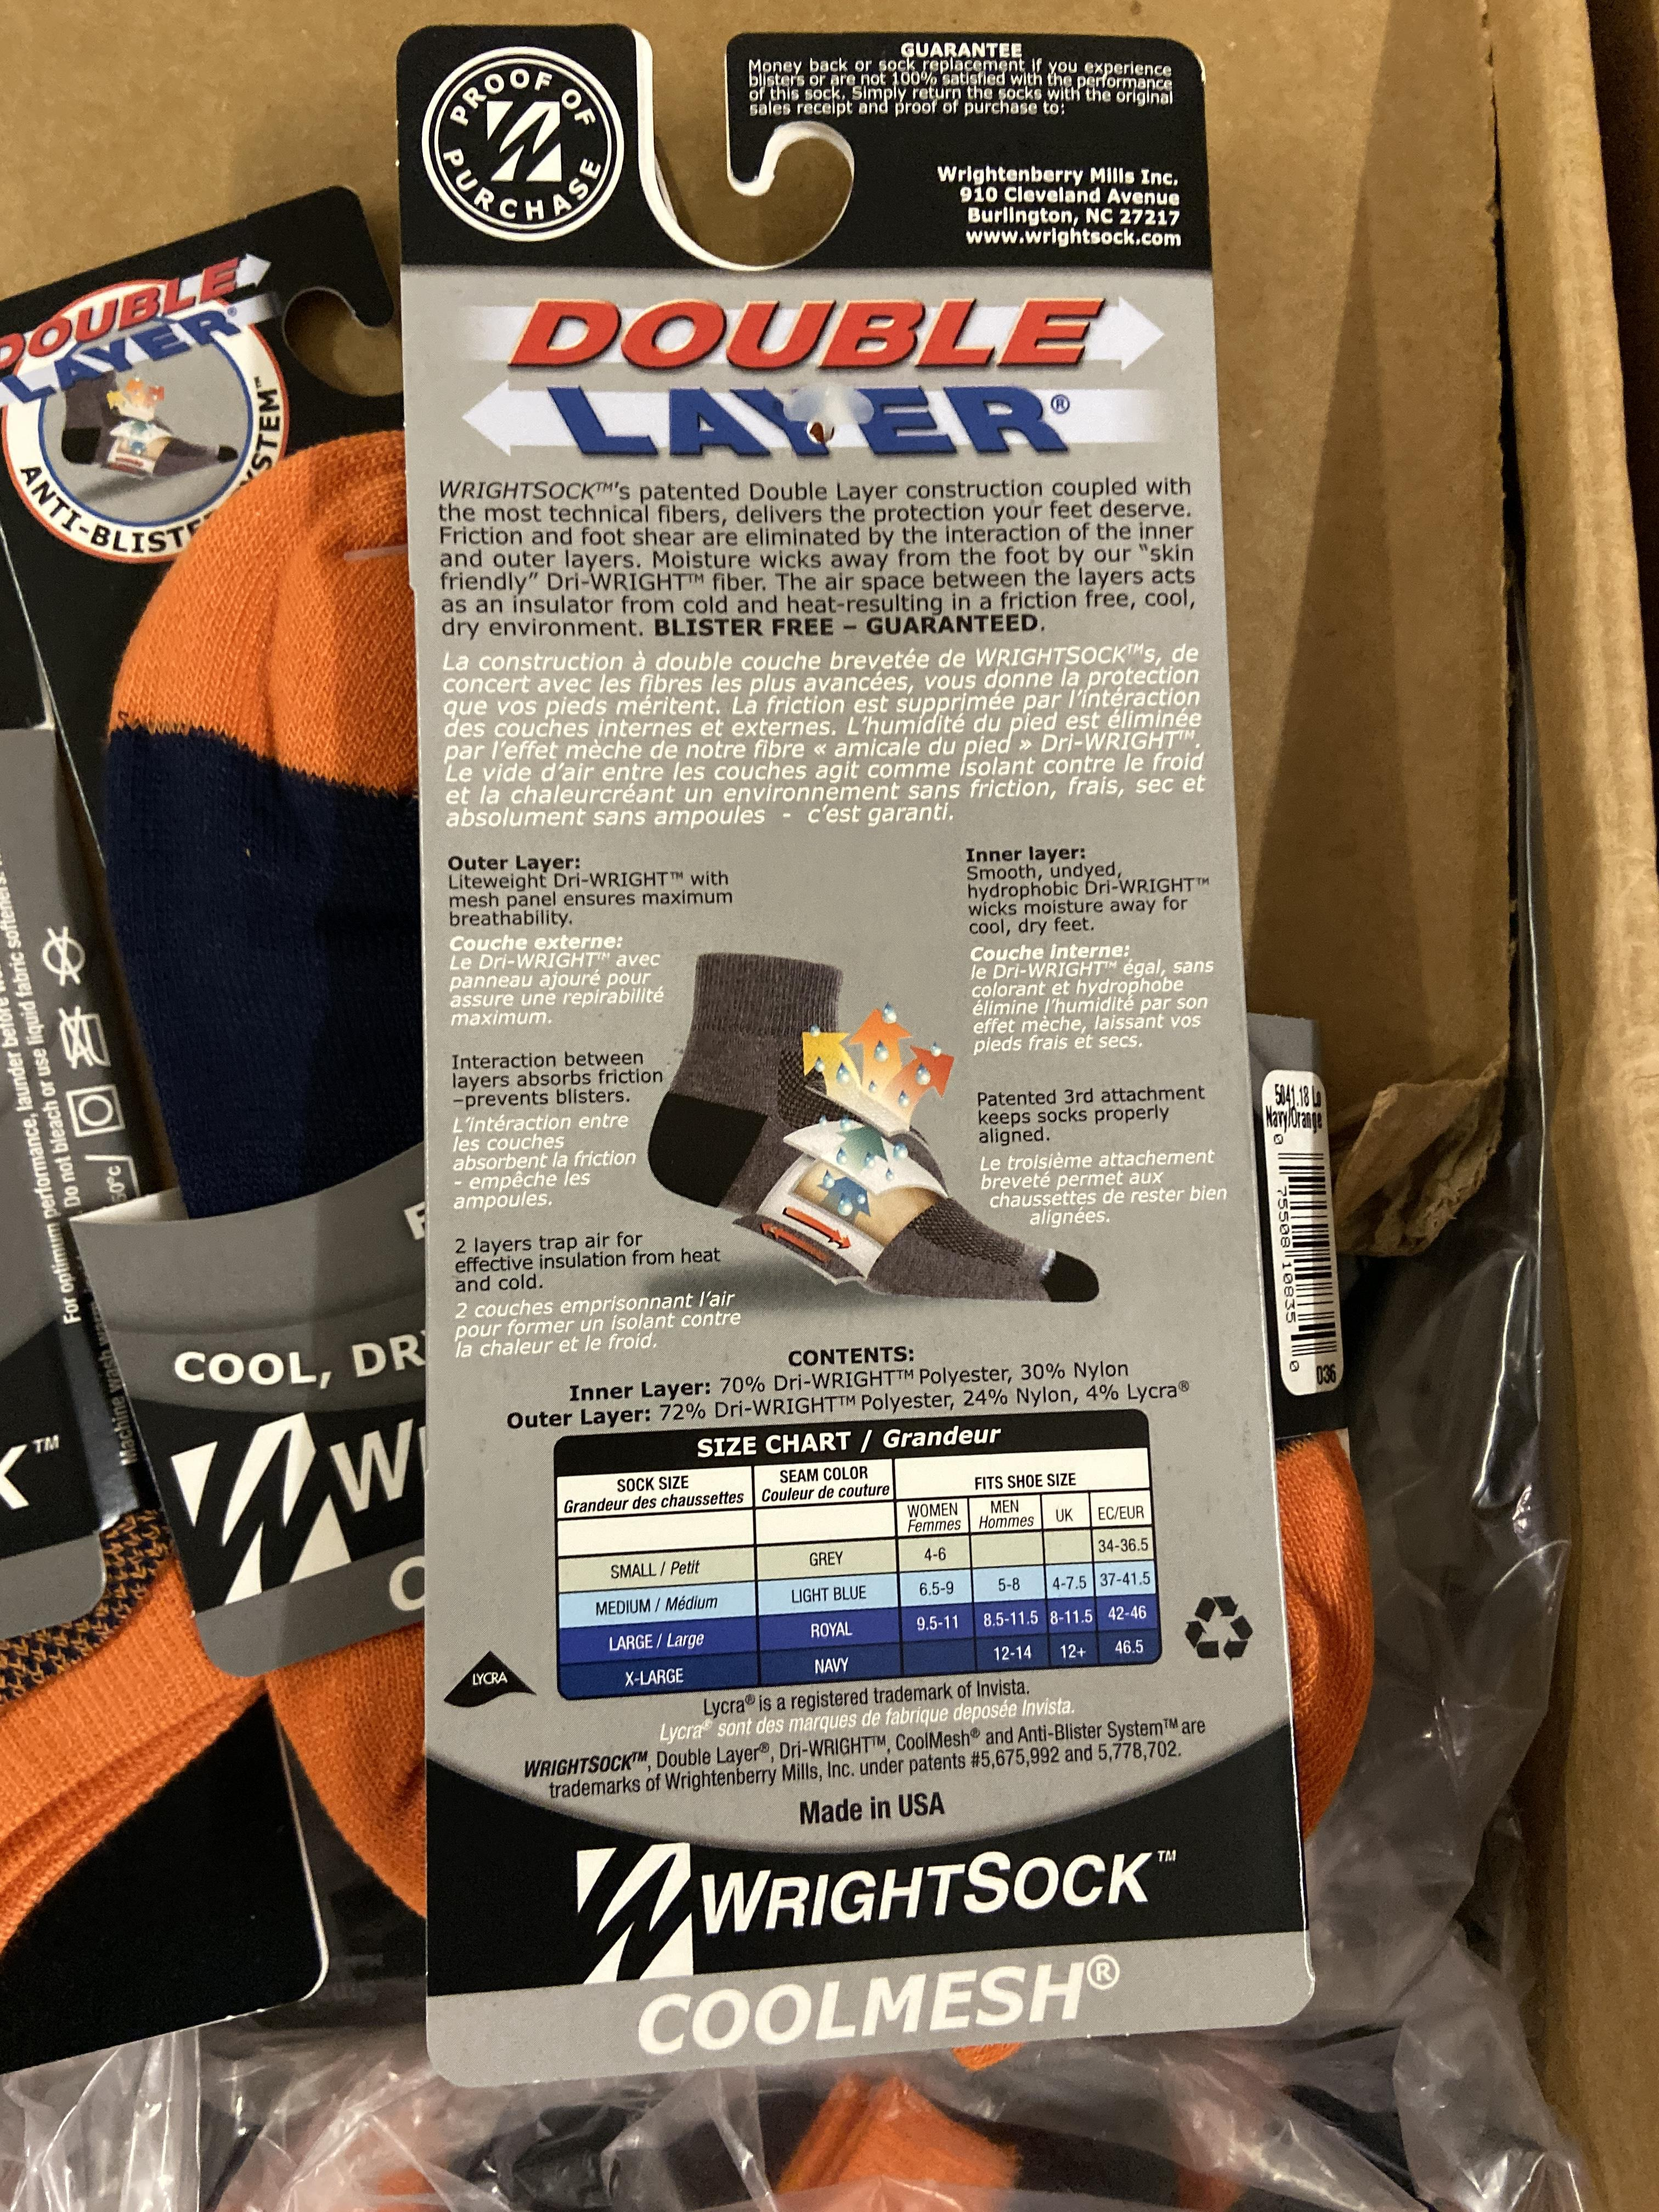 250+ packs of New Socks, Wrightsock Coolmesh, Double Layer, Orange/Black - Image 3 of 3